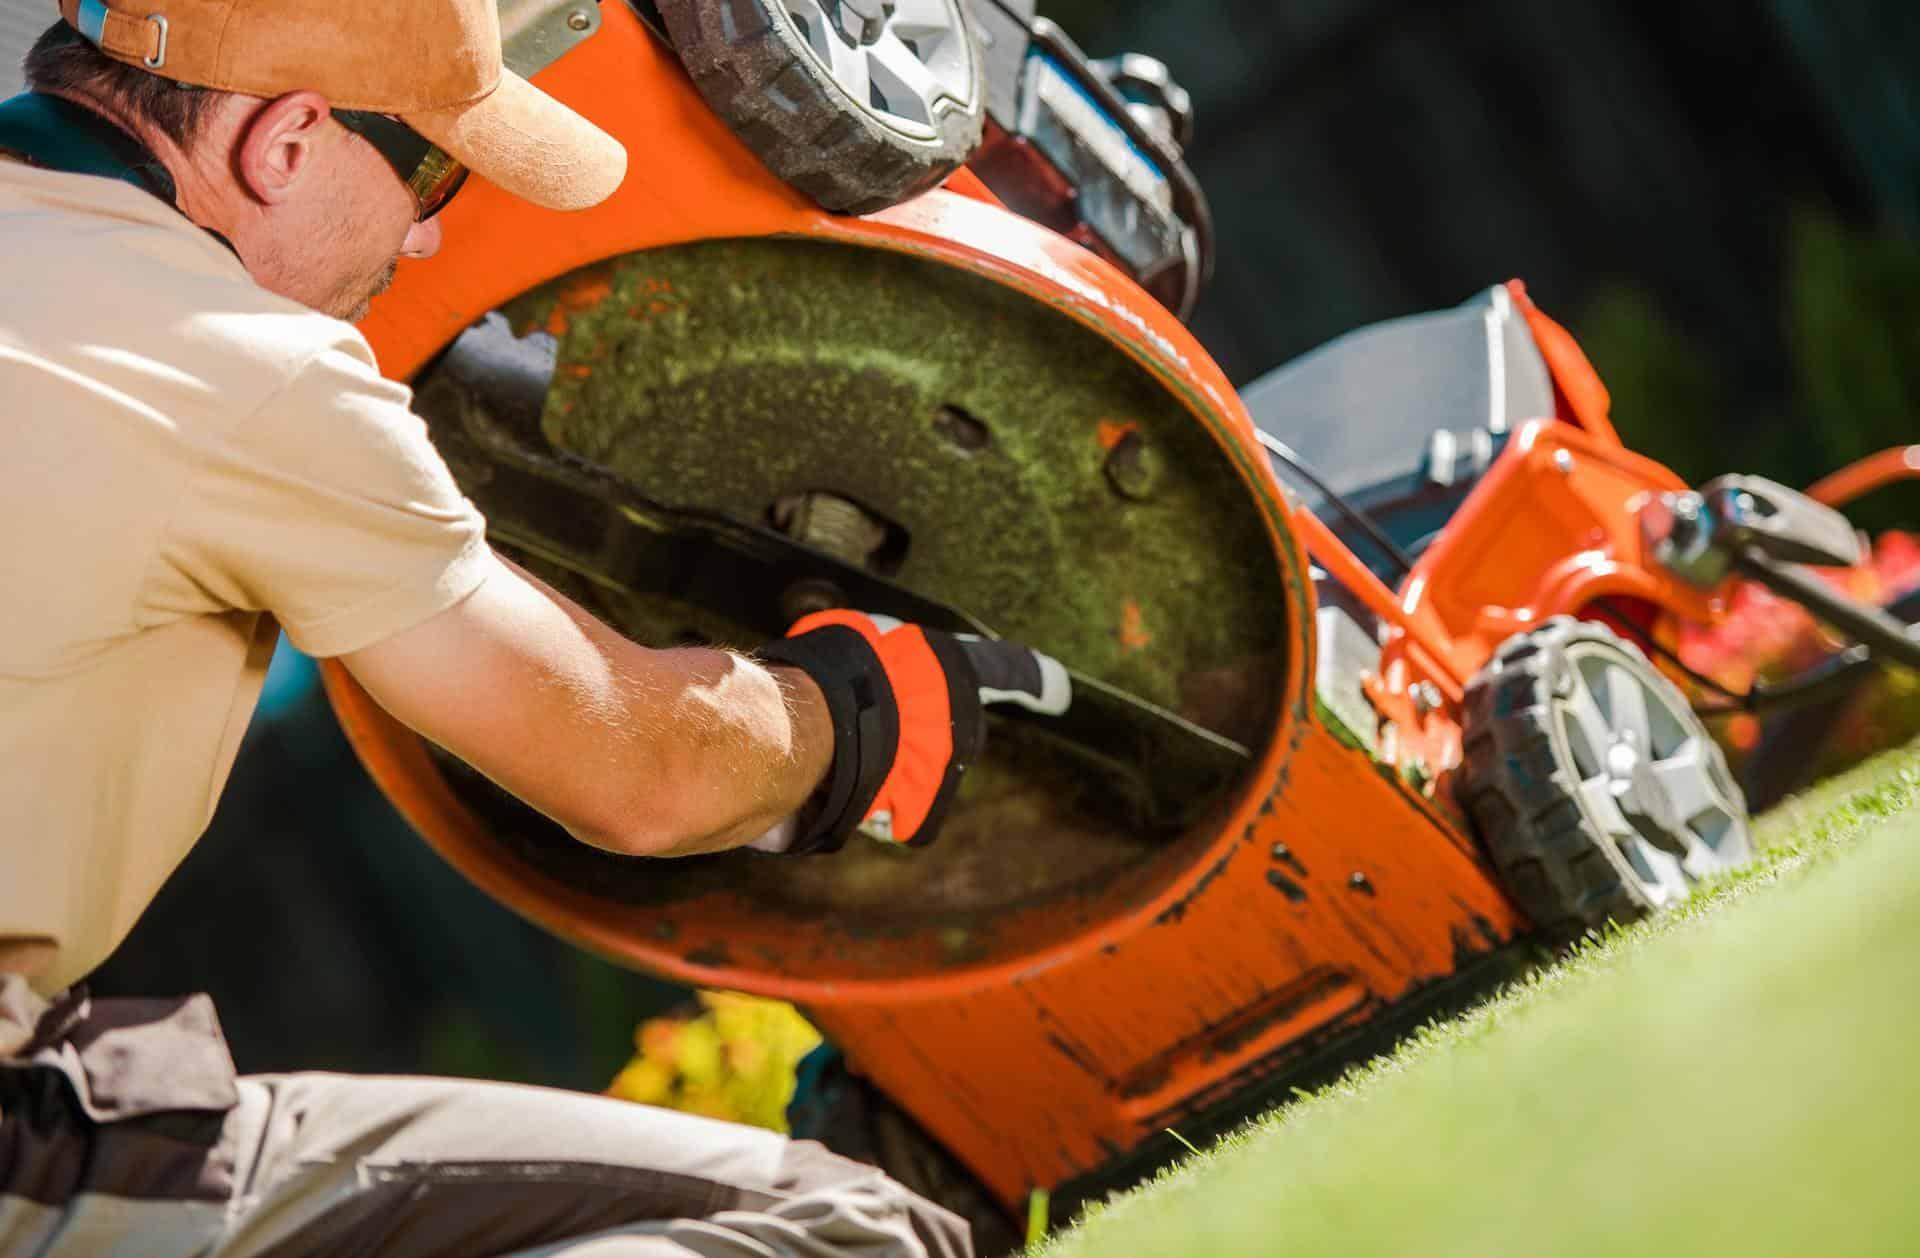 Checking Lawn Mower Blades